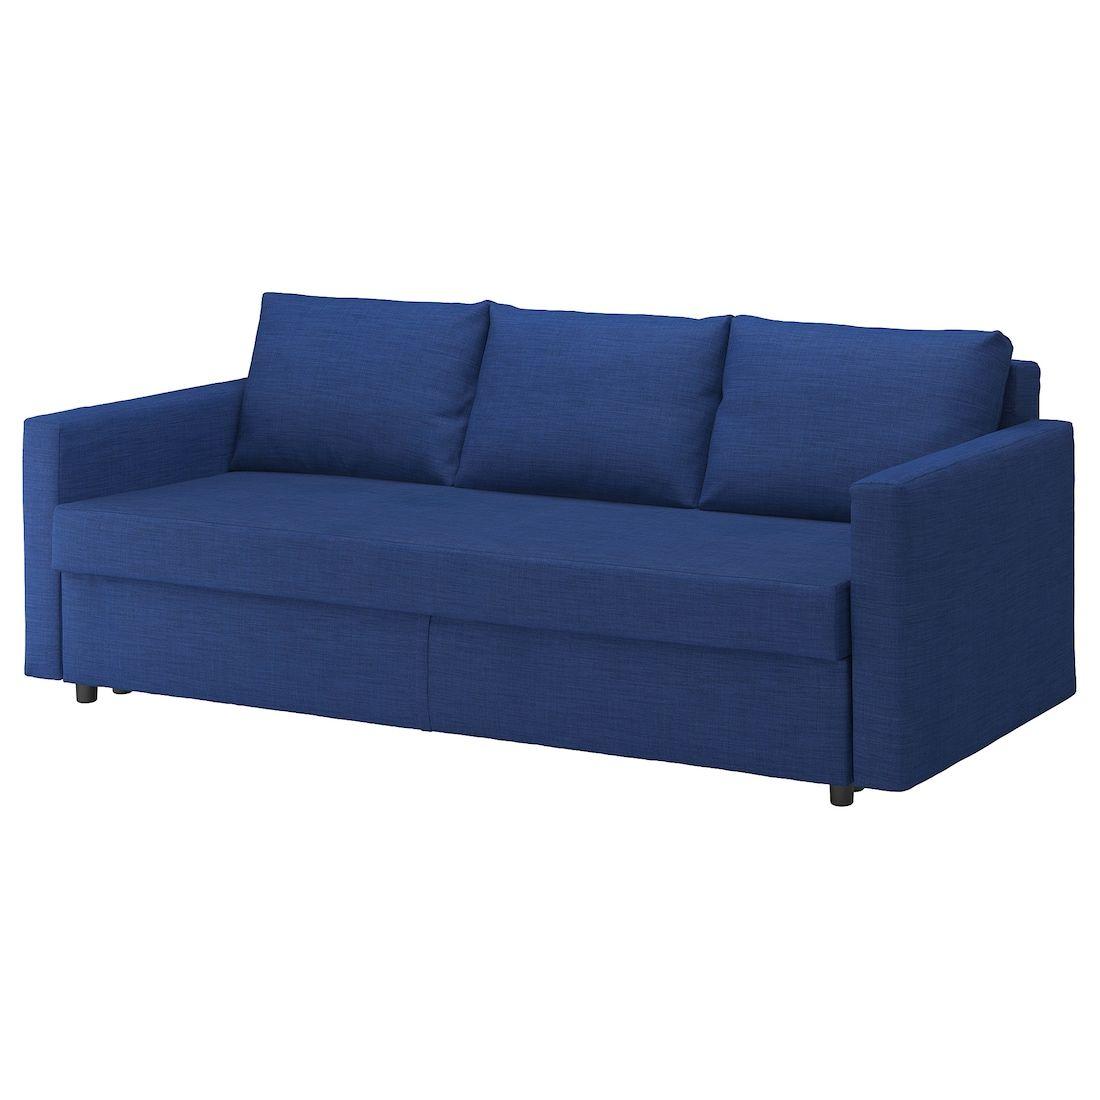 Friheten Sleeper Sofa Skiftebo Blue Cheap Sofa Beds Corner Sofa Bed Cheap Sofas